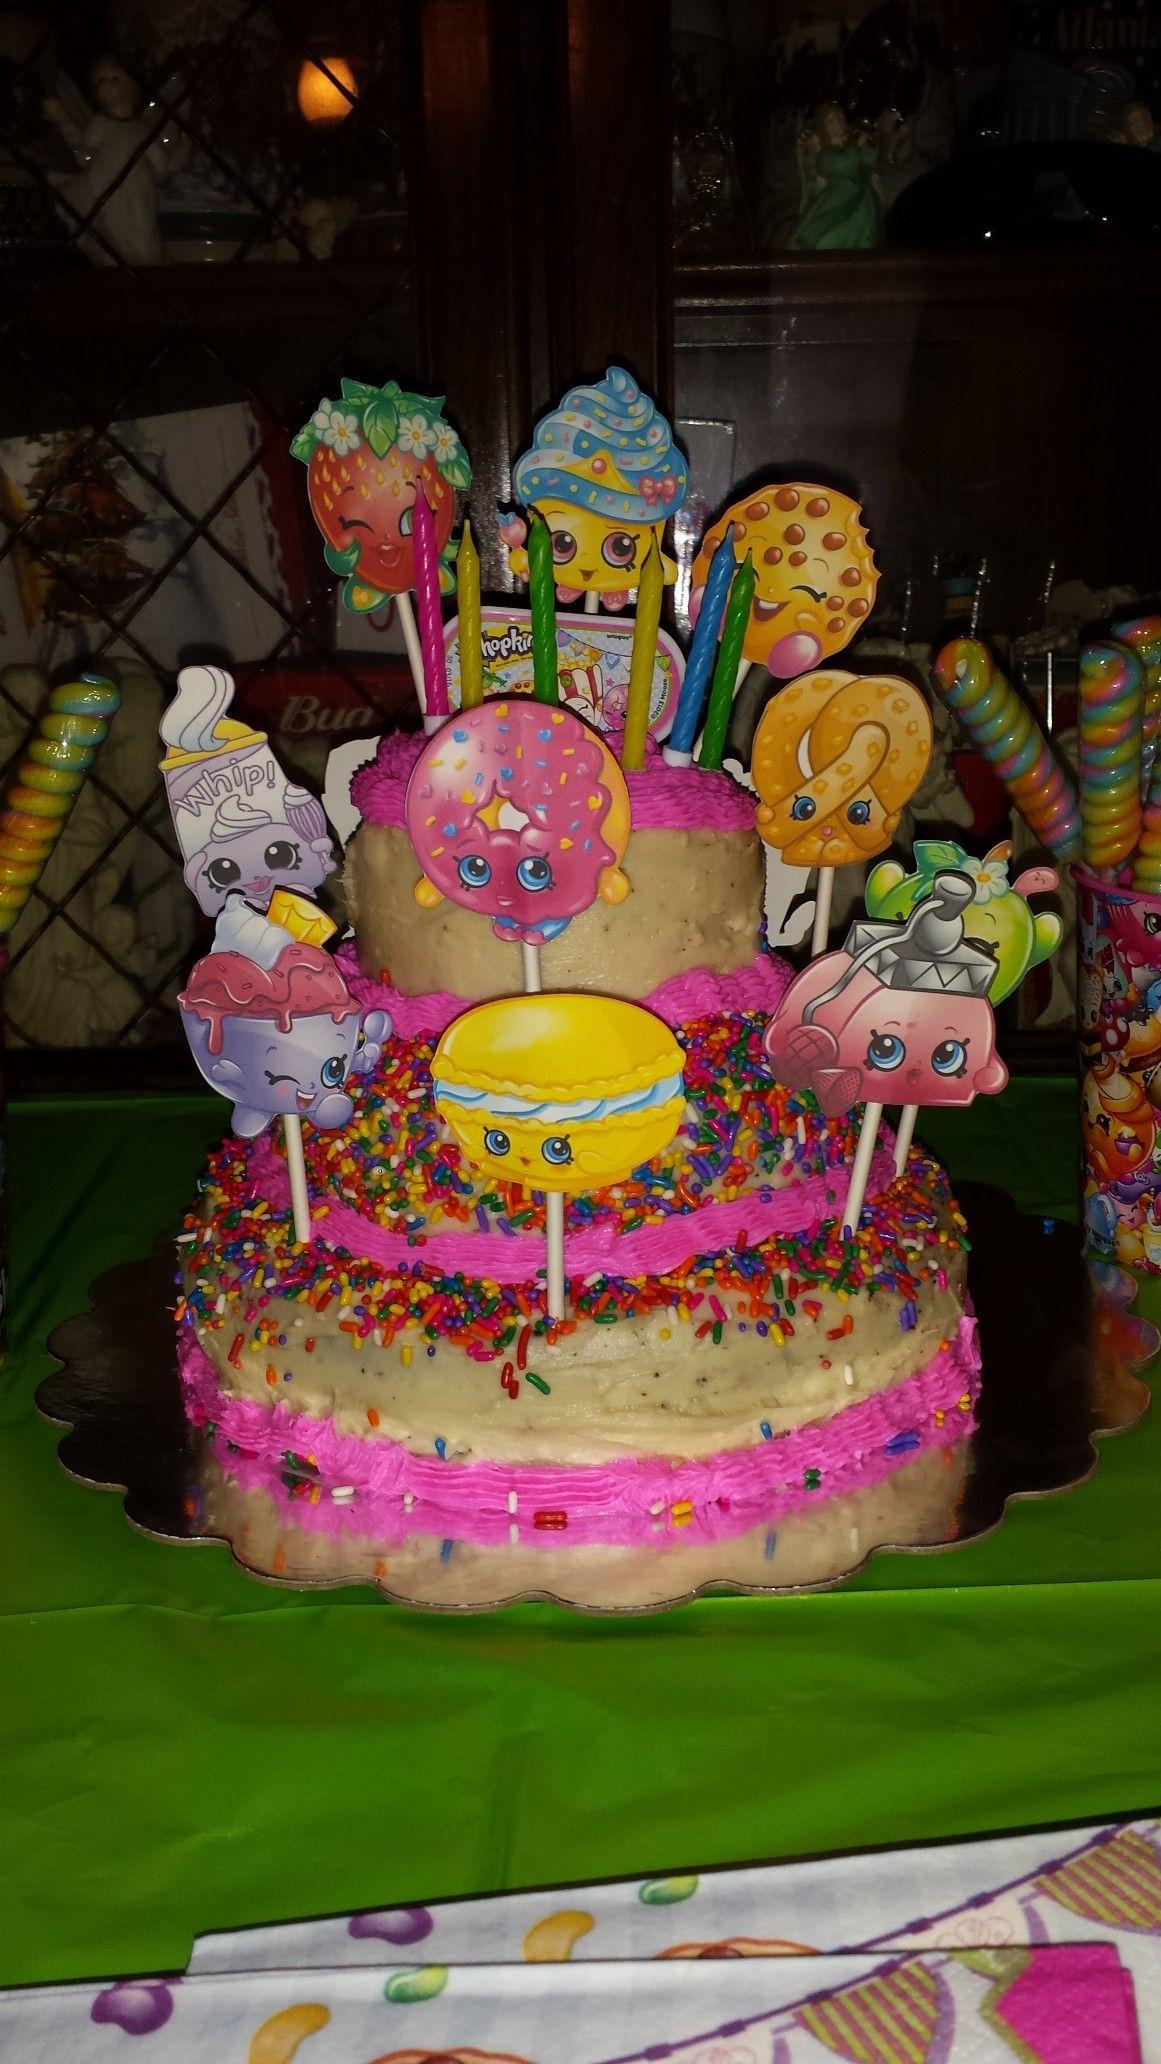 Shopkins Cake Oct 2016 Cora Ann Cakes My Original Work